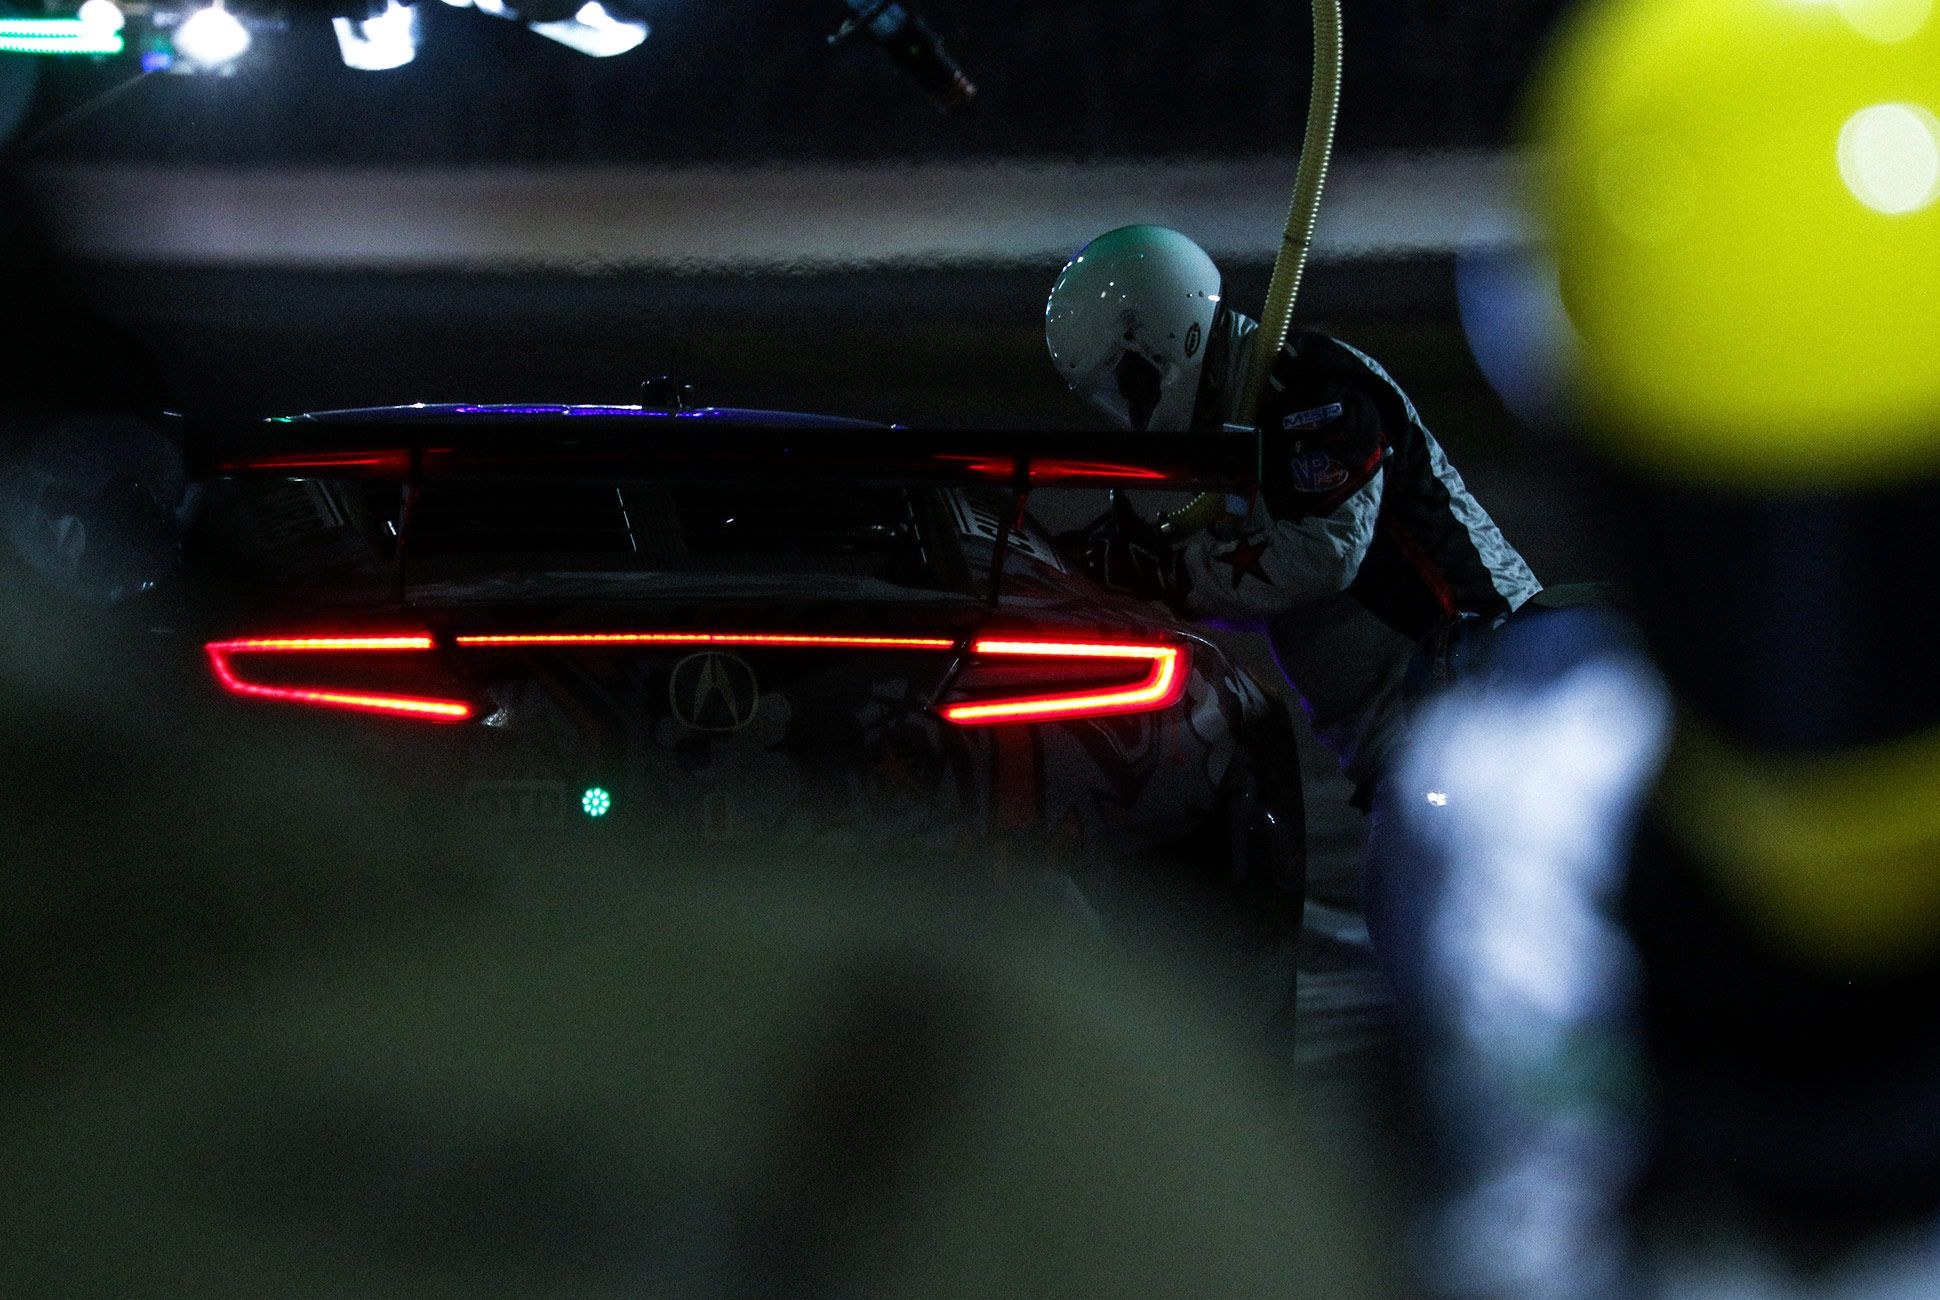 Best-Sports-Cars-of-2018-Daytona-24-Hours-gear-patrol-Acura-NSX-GT3-3